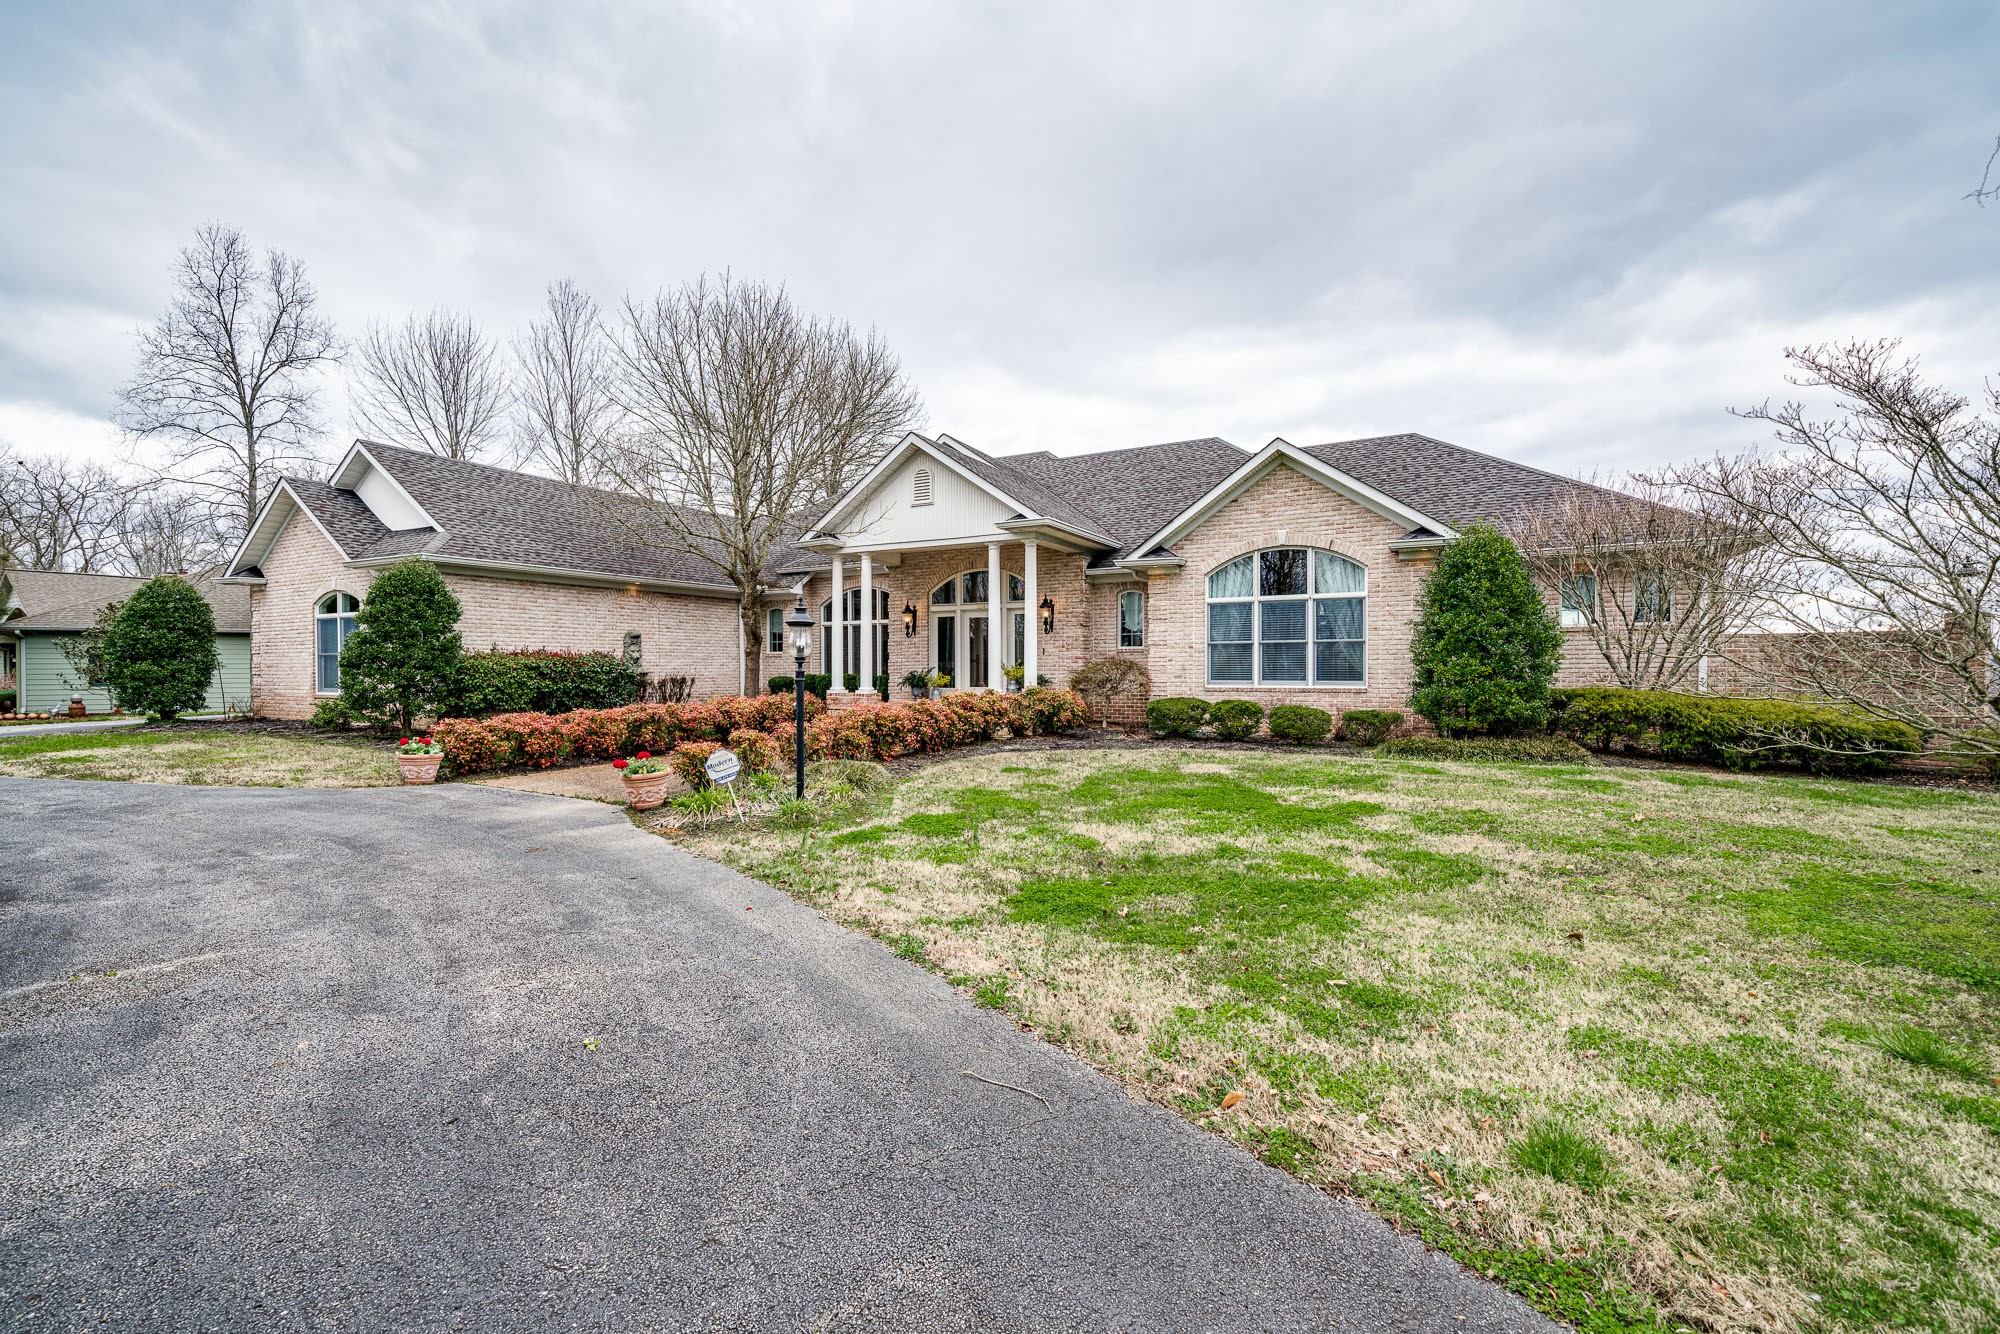 1954 Old Hwy 53, E, Celina, TN 38551 - Celina, TN real estate listing